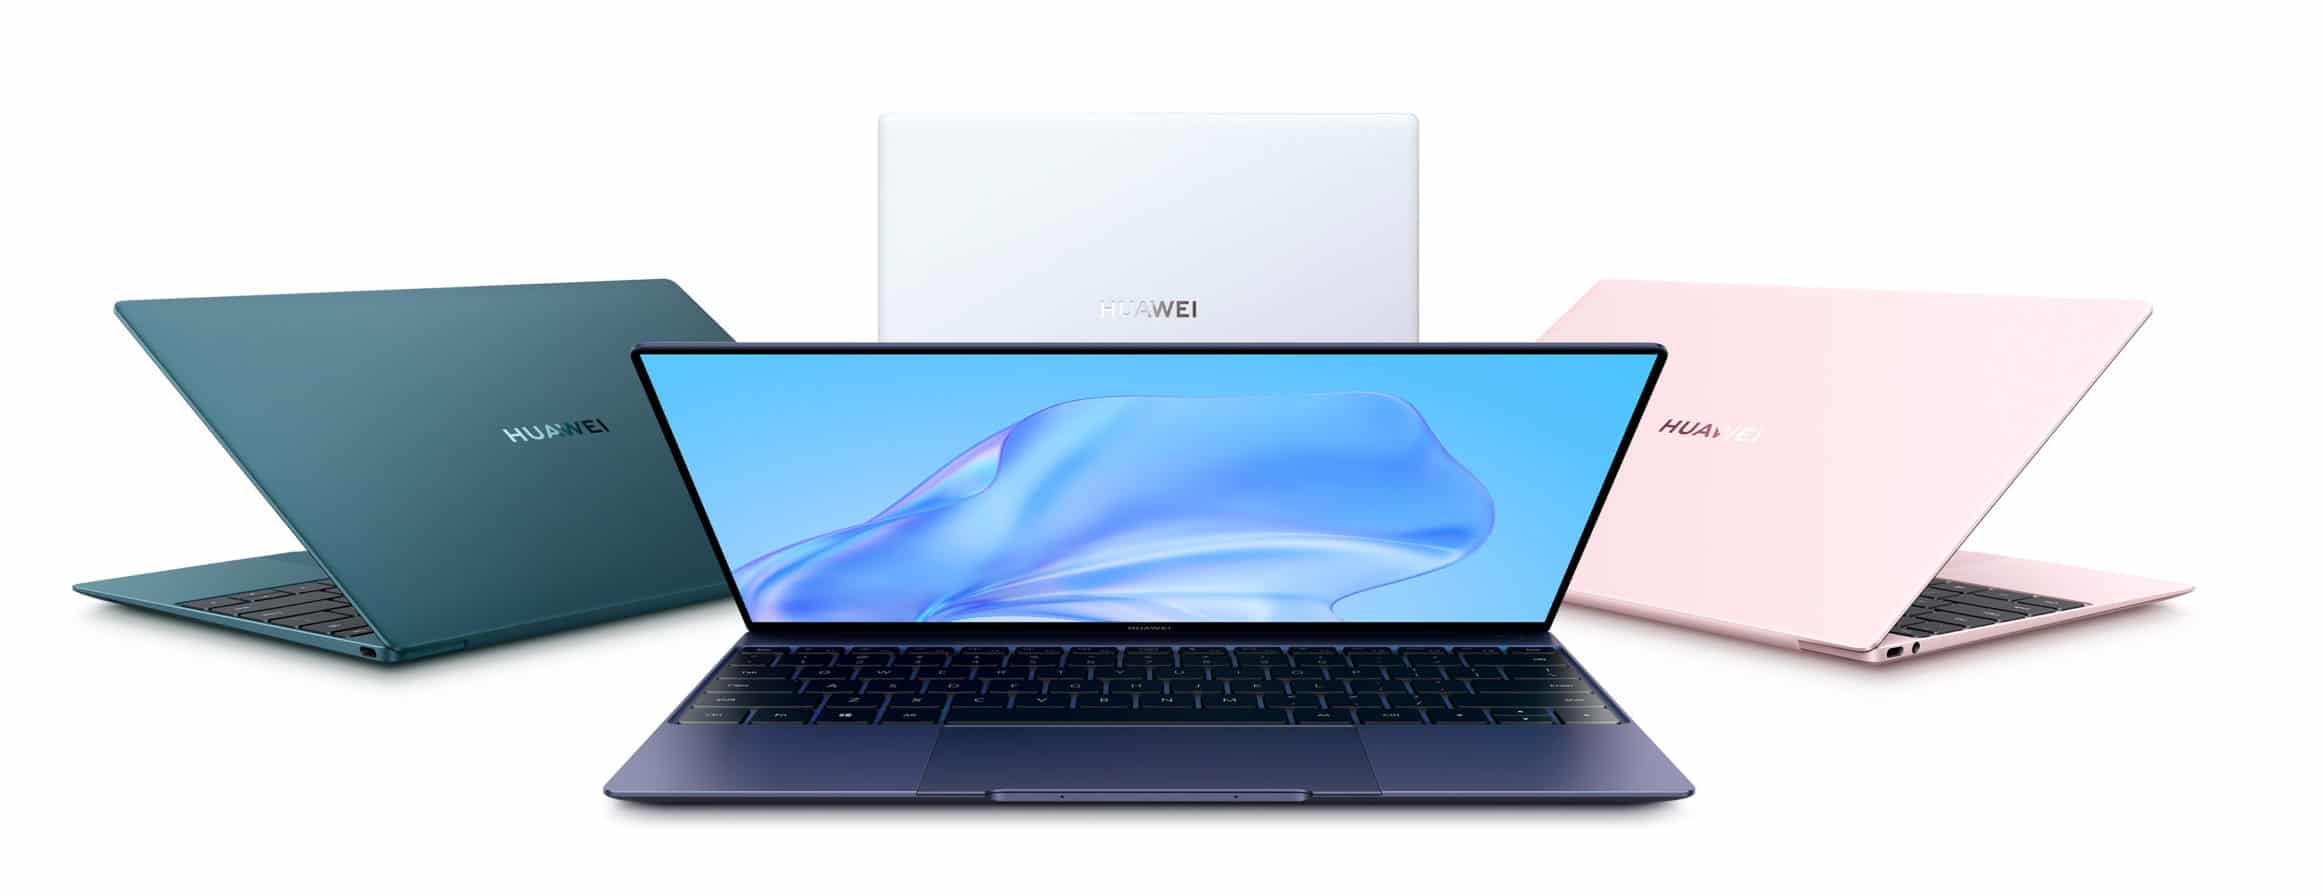 Huawei MateBook X 2 scaled e1599764576702